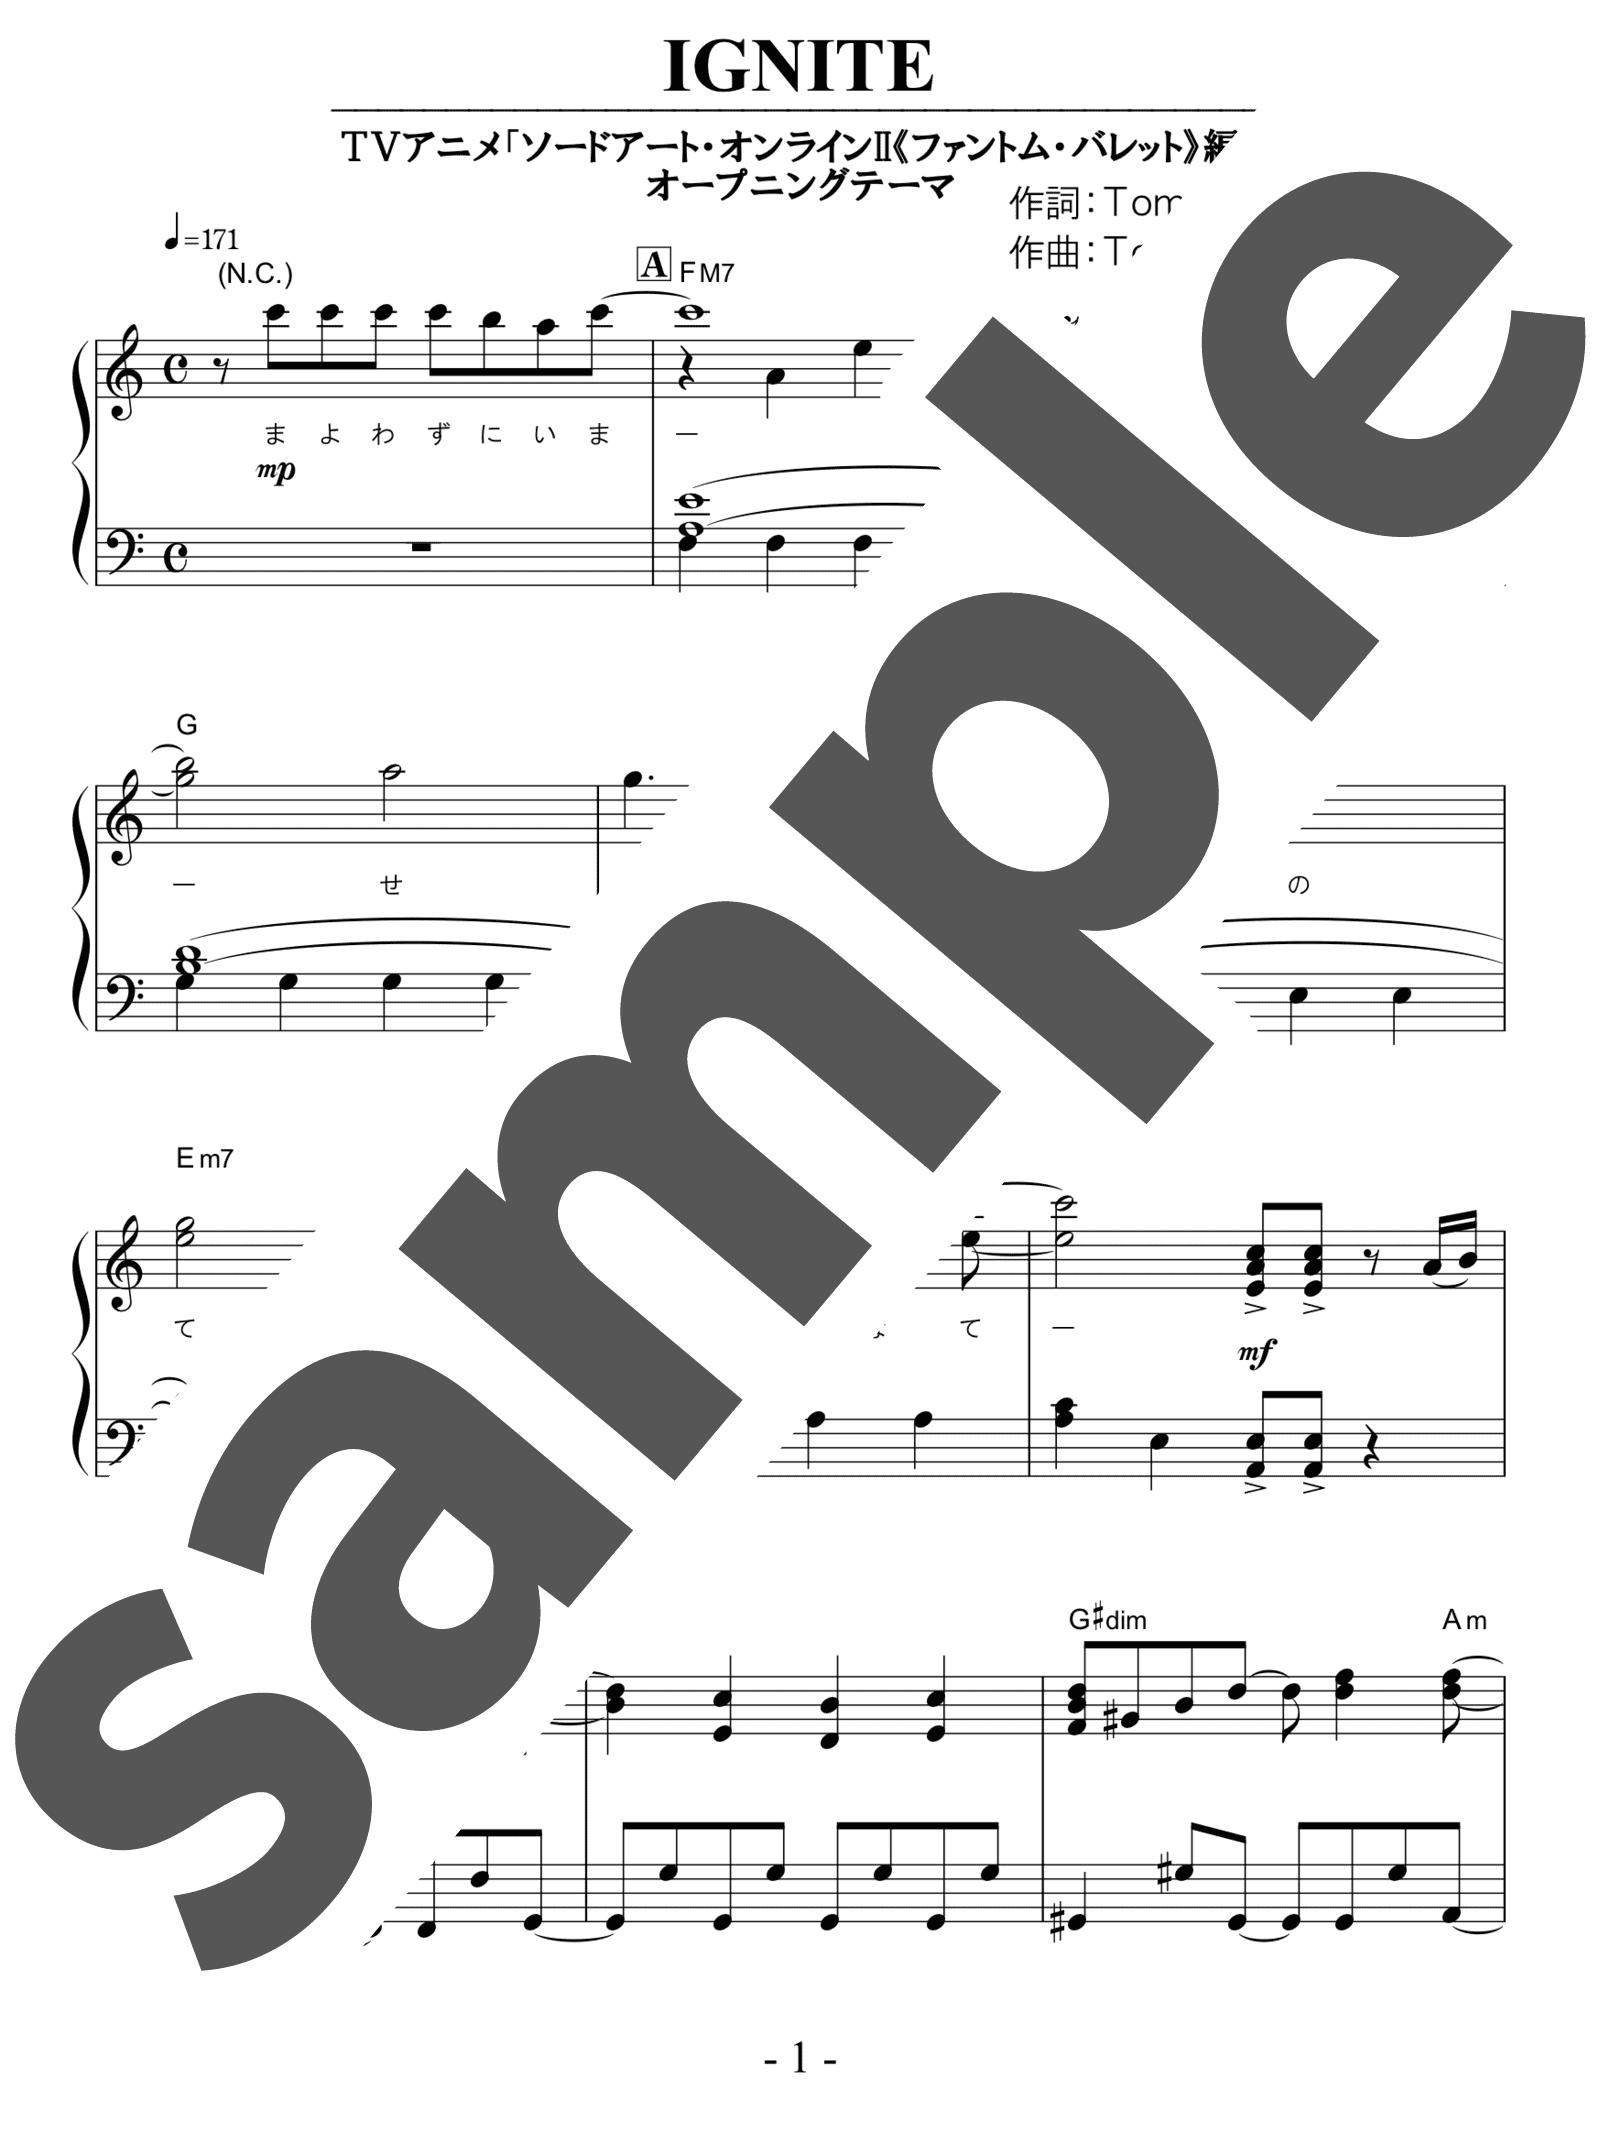 「IGNITE」のサンプル楽譜